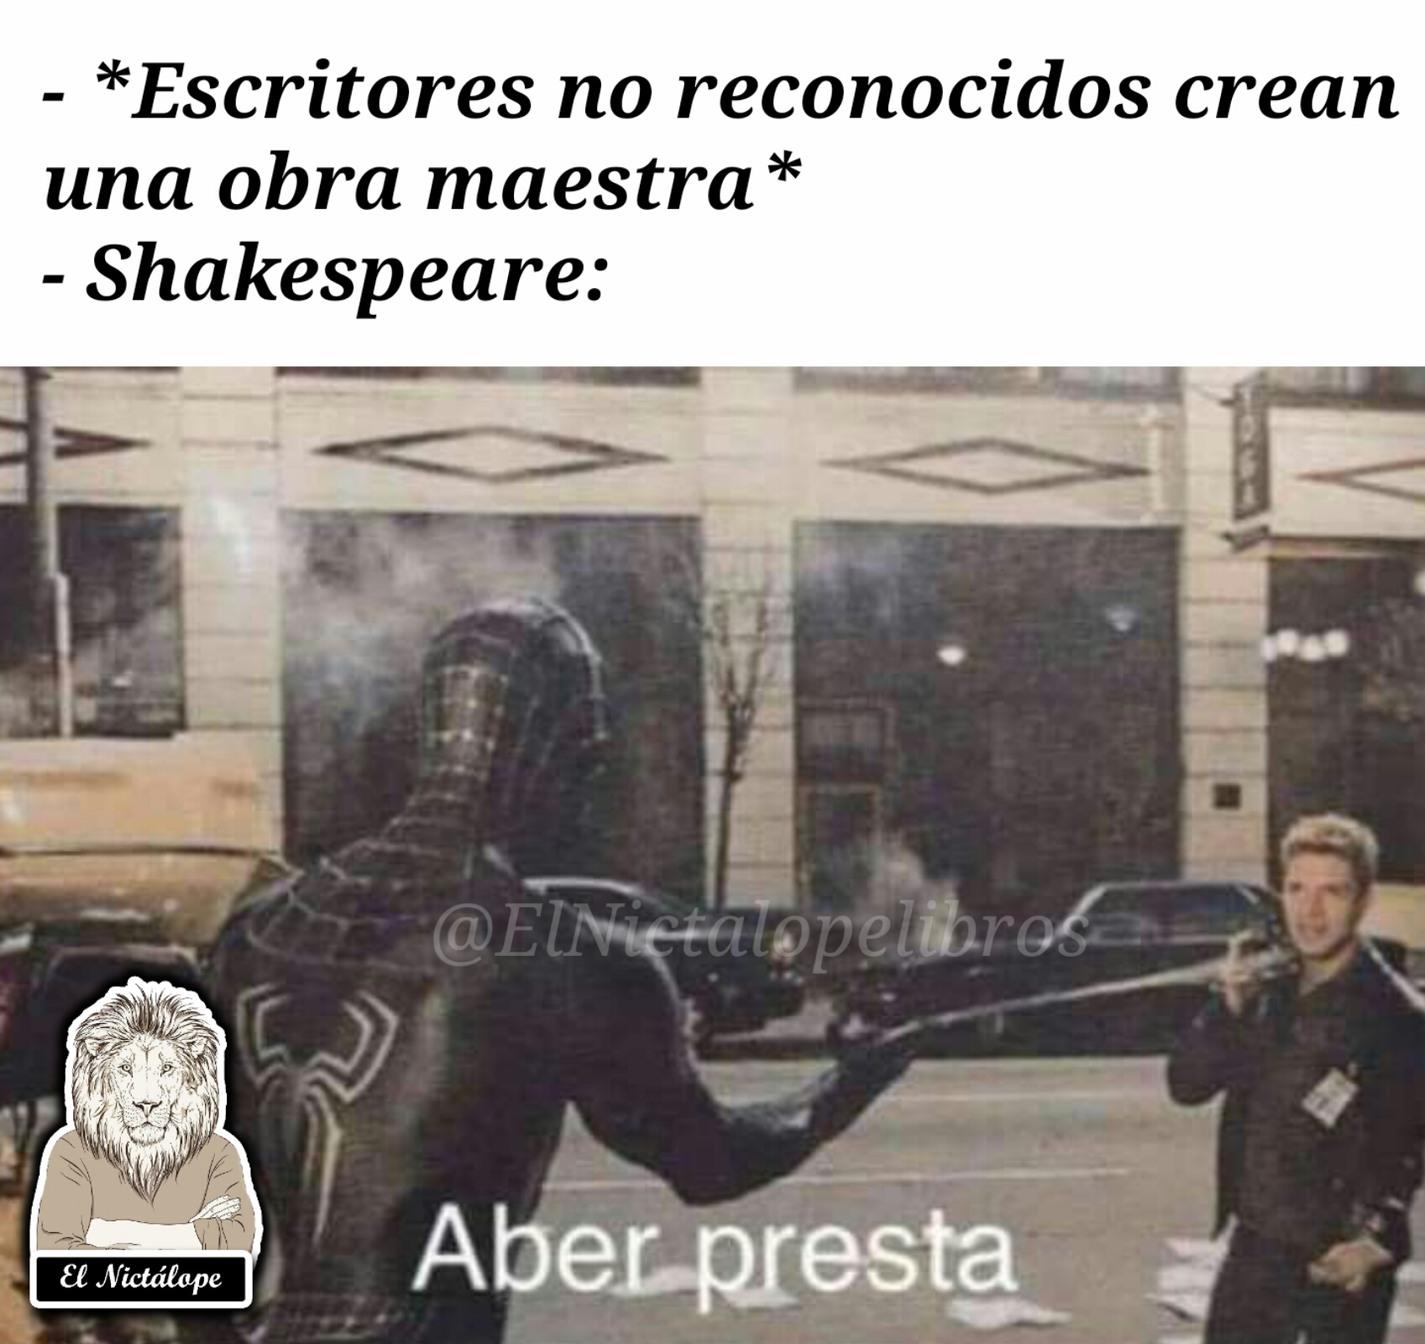 Shakespeare hacia repost - meme